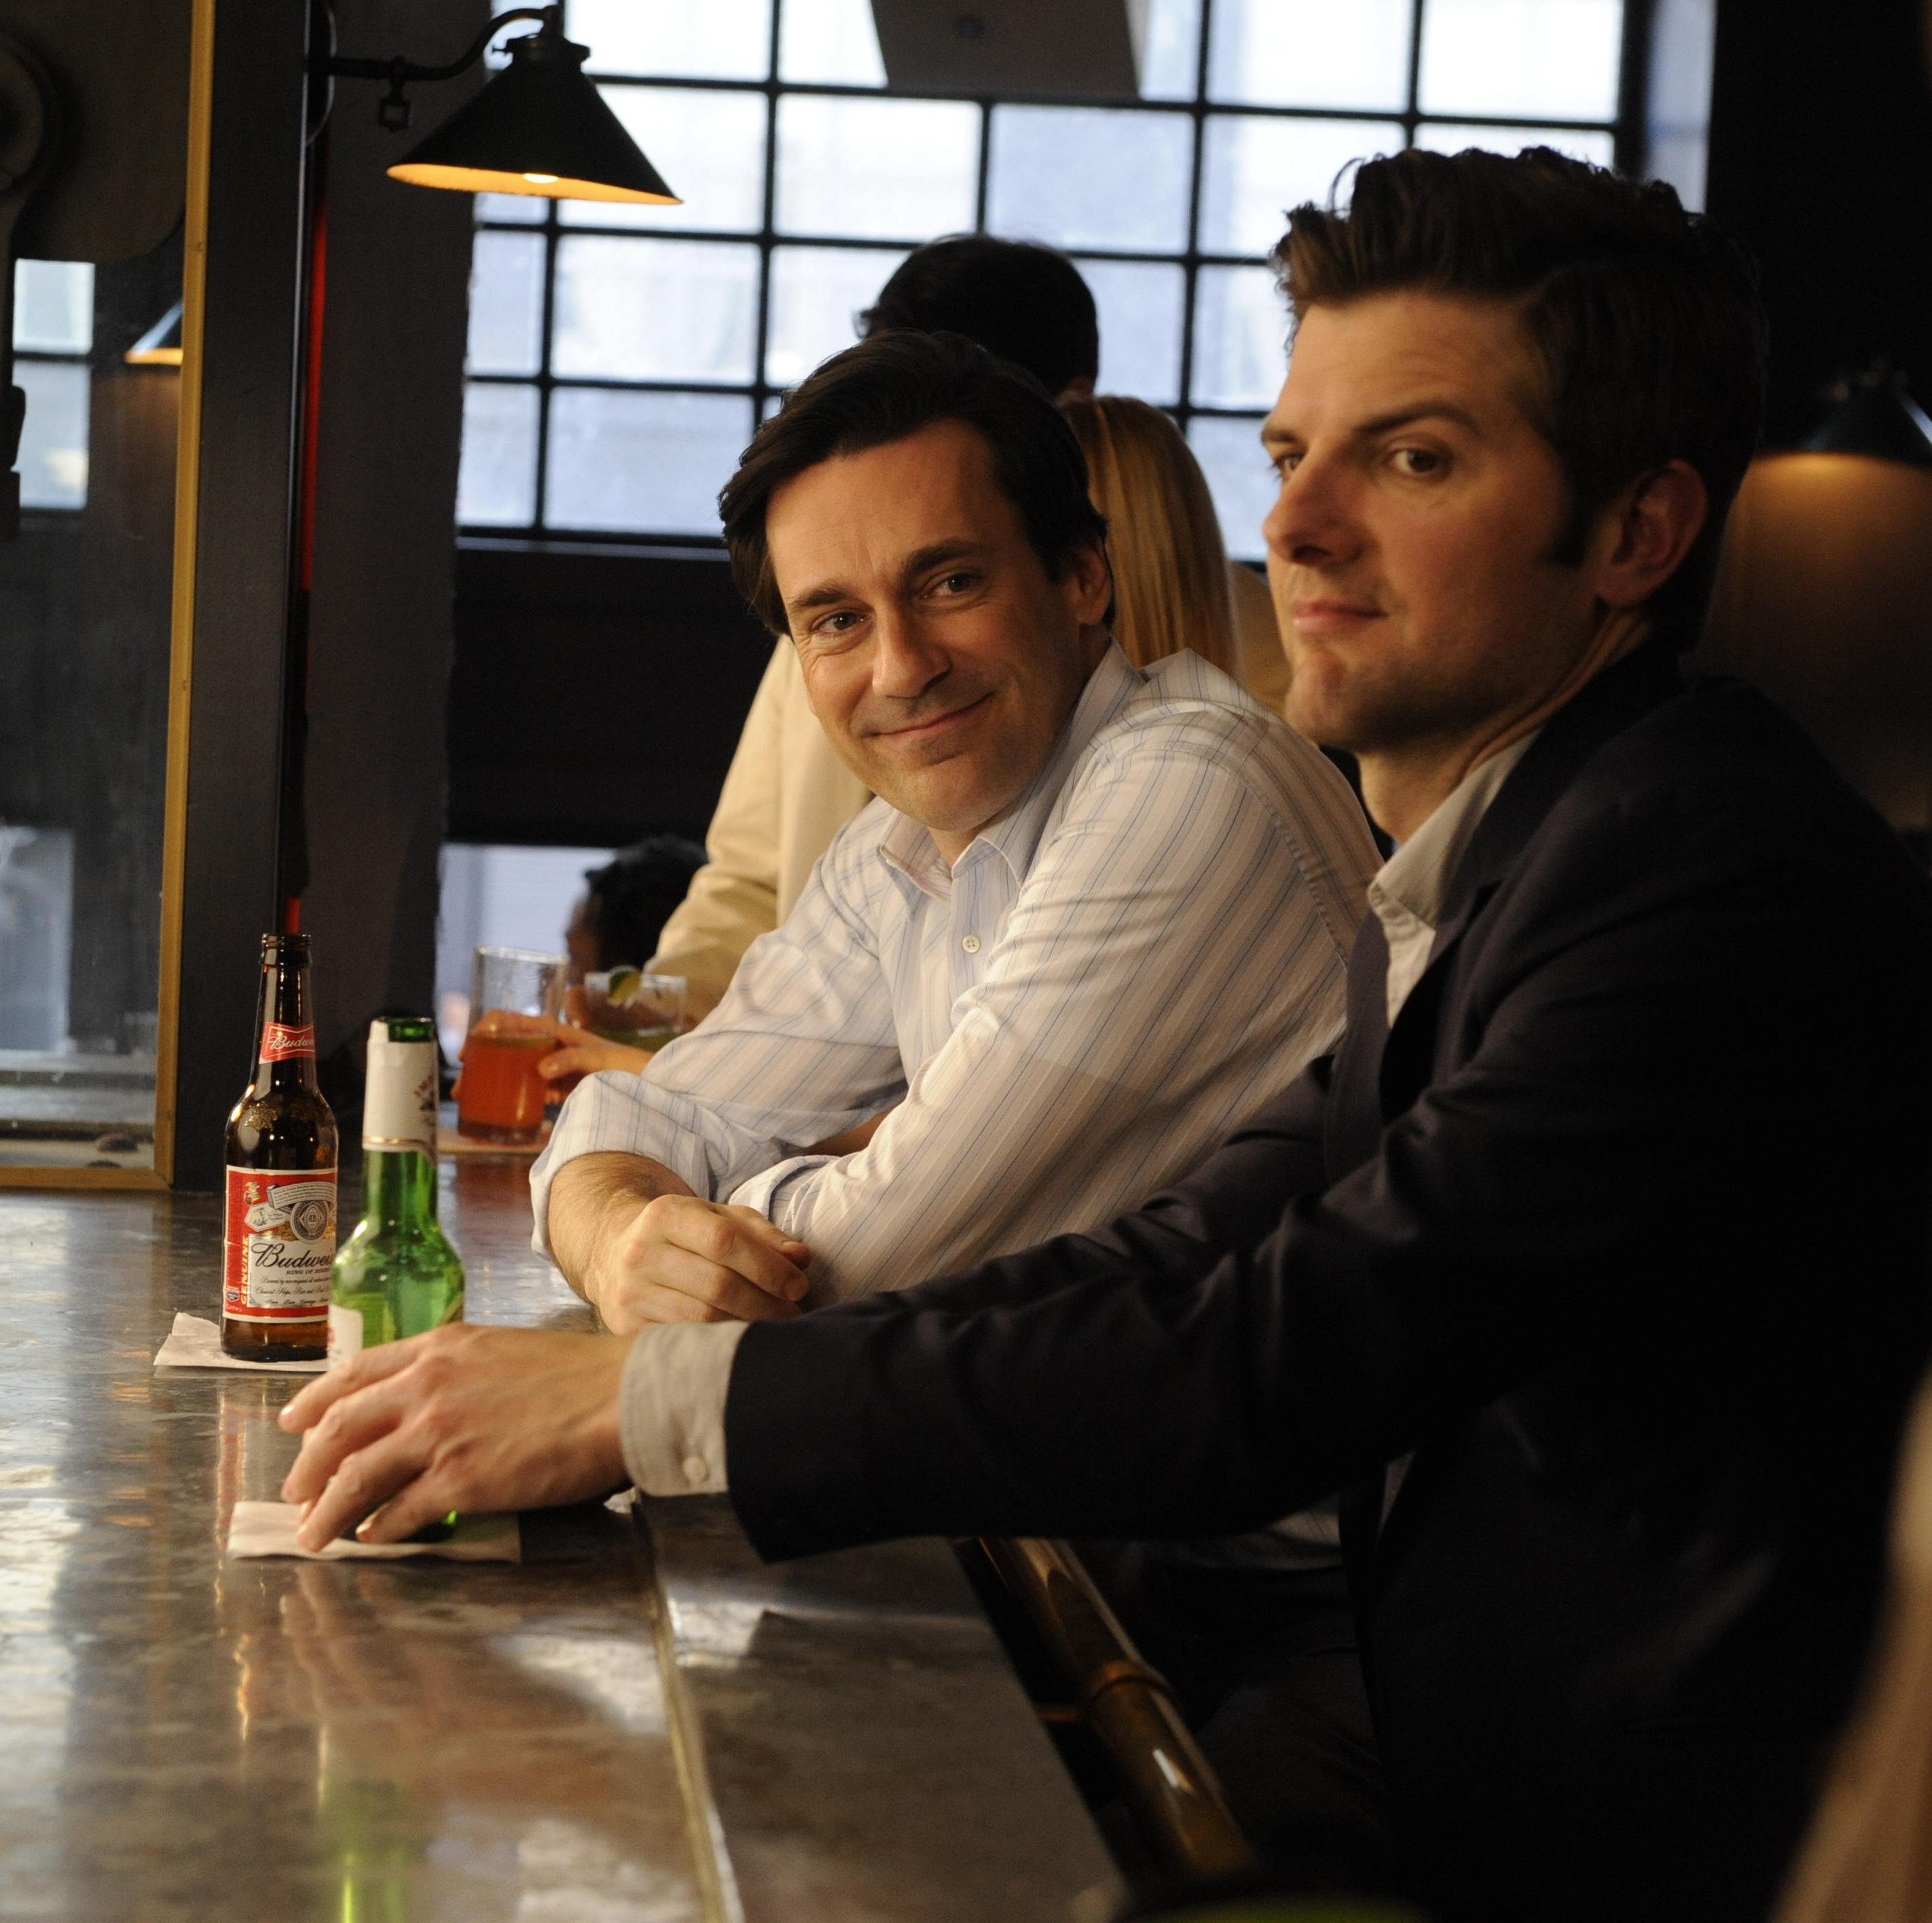 When Jon Hamm and Adam Scott Play Jerks: More Friends With Kids Talk ...: http://www.vulture.com/2012/03/when-jon-hamm-and-adam-scott-play-jerks-more-friends-with-kids-talk.html